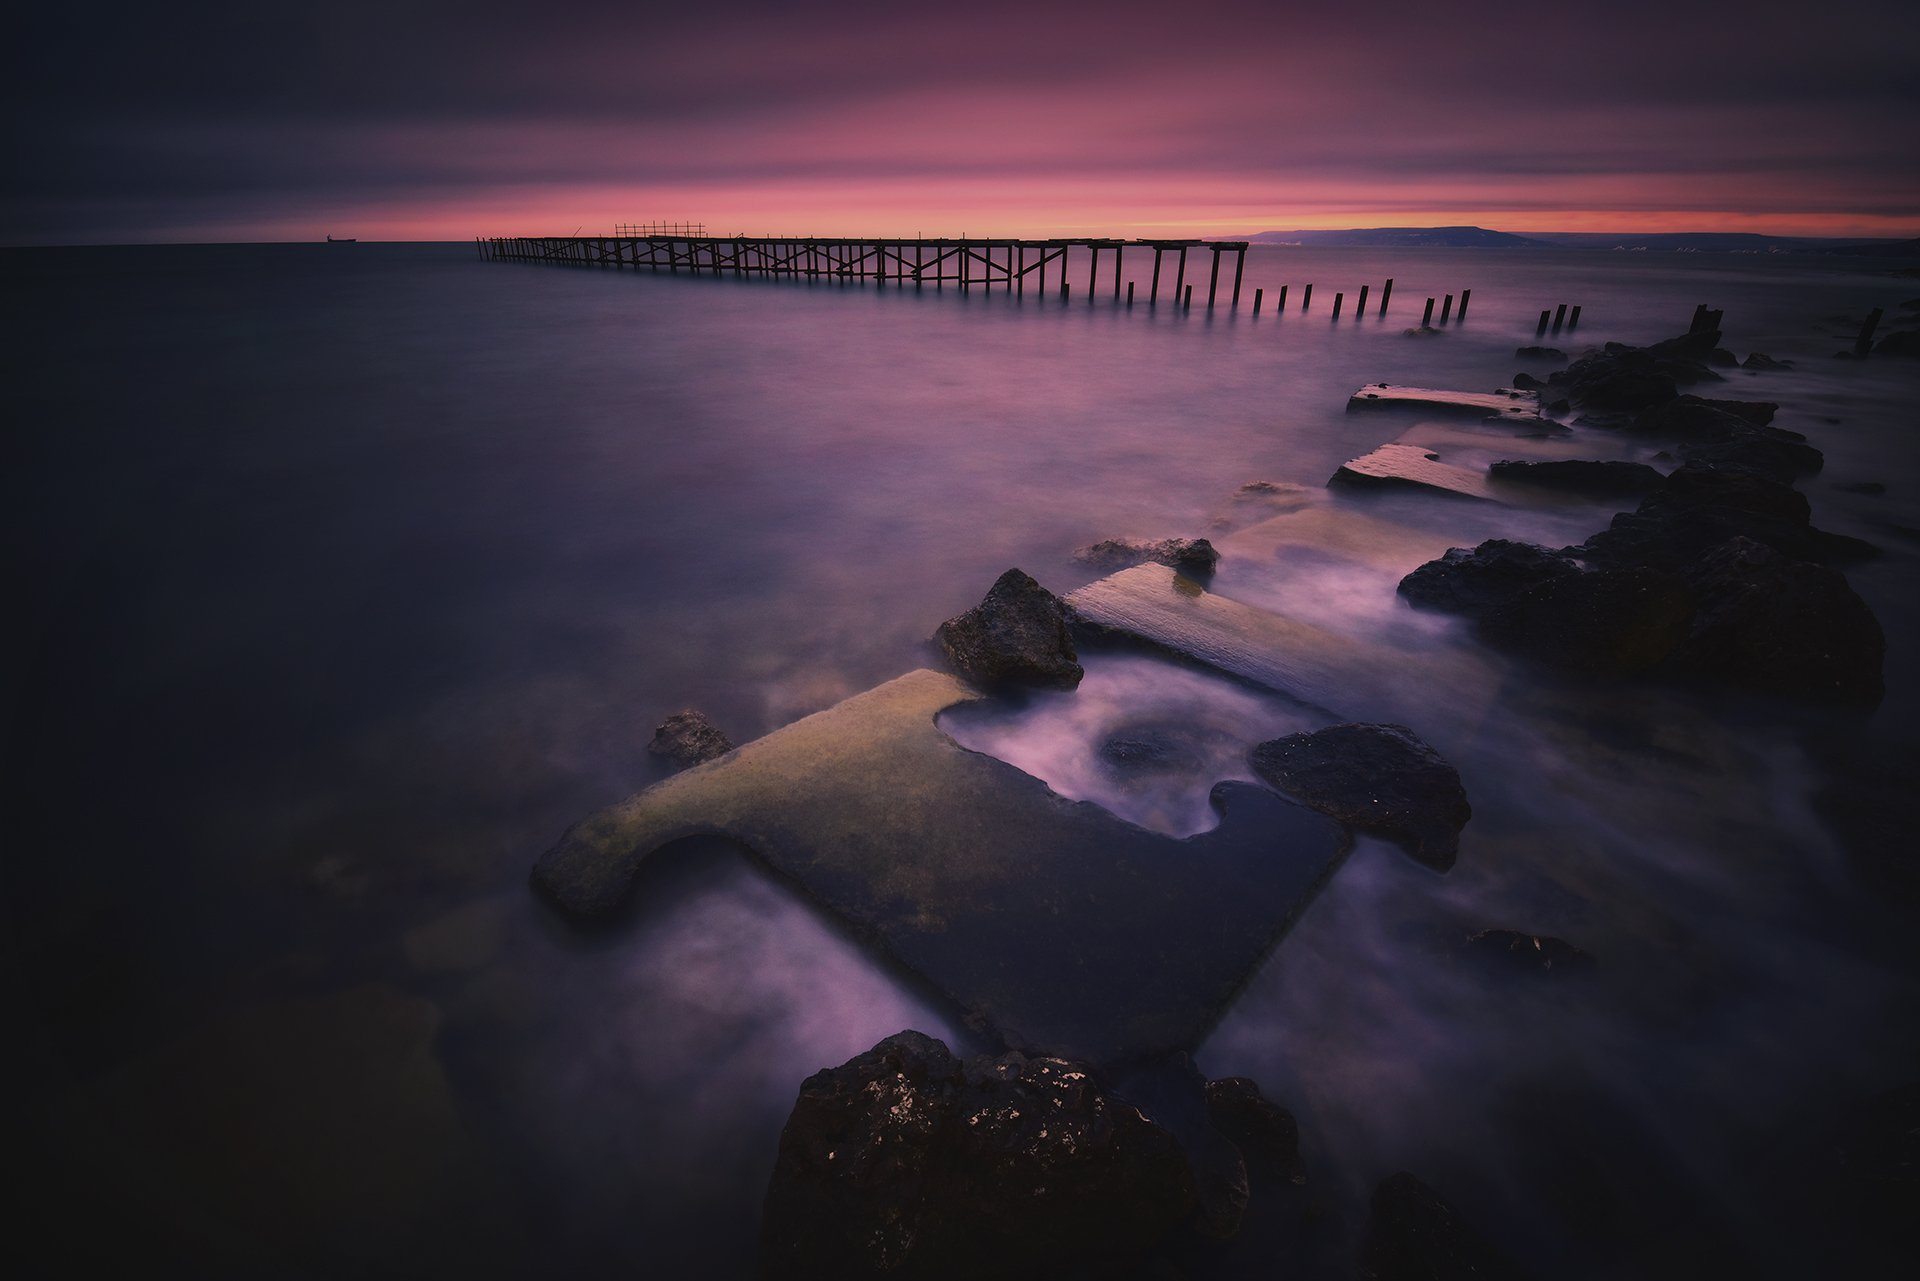 landscape, seascape, blacksea, sea, пейзаж, природа, Genadi Dochev